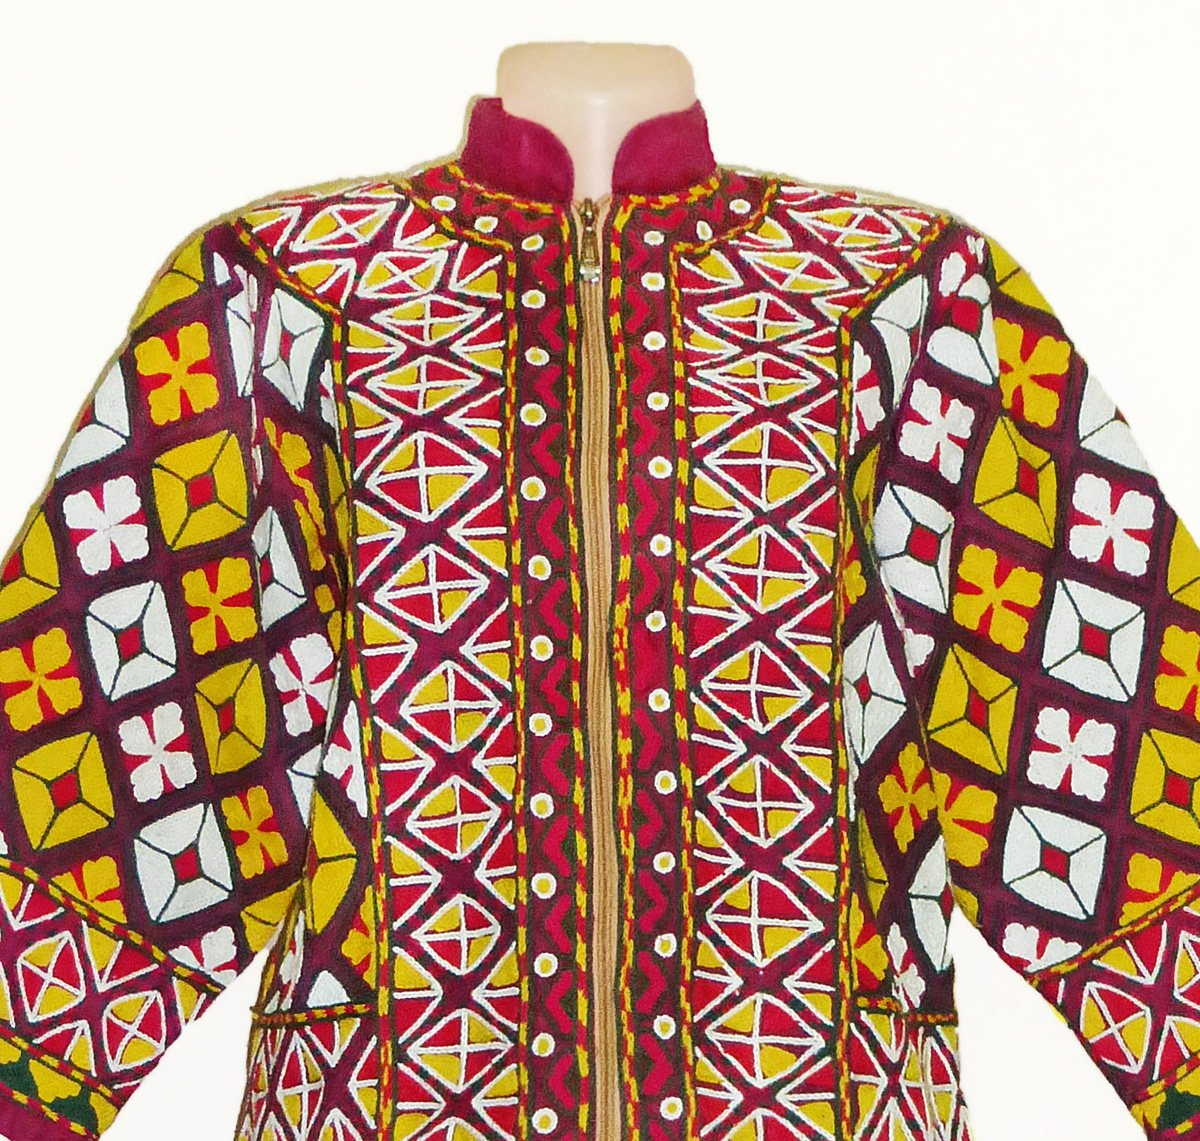 stunning uzbek fully handmade silk embroidered jacket outwear b741 by East treasures